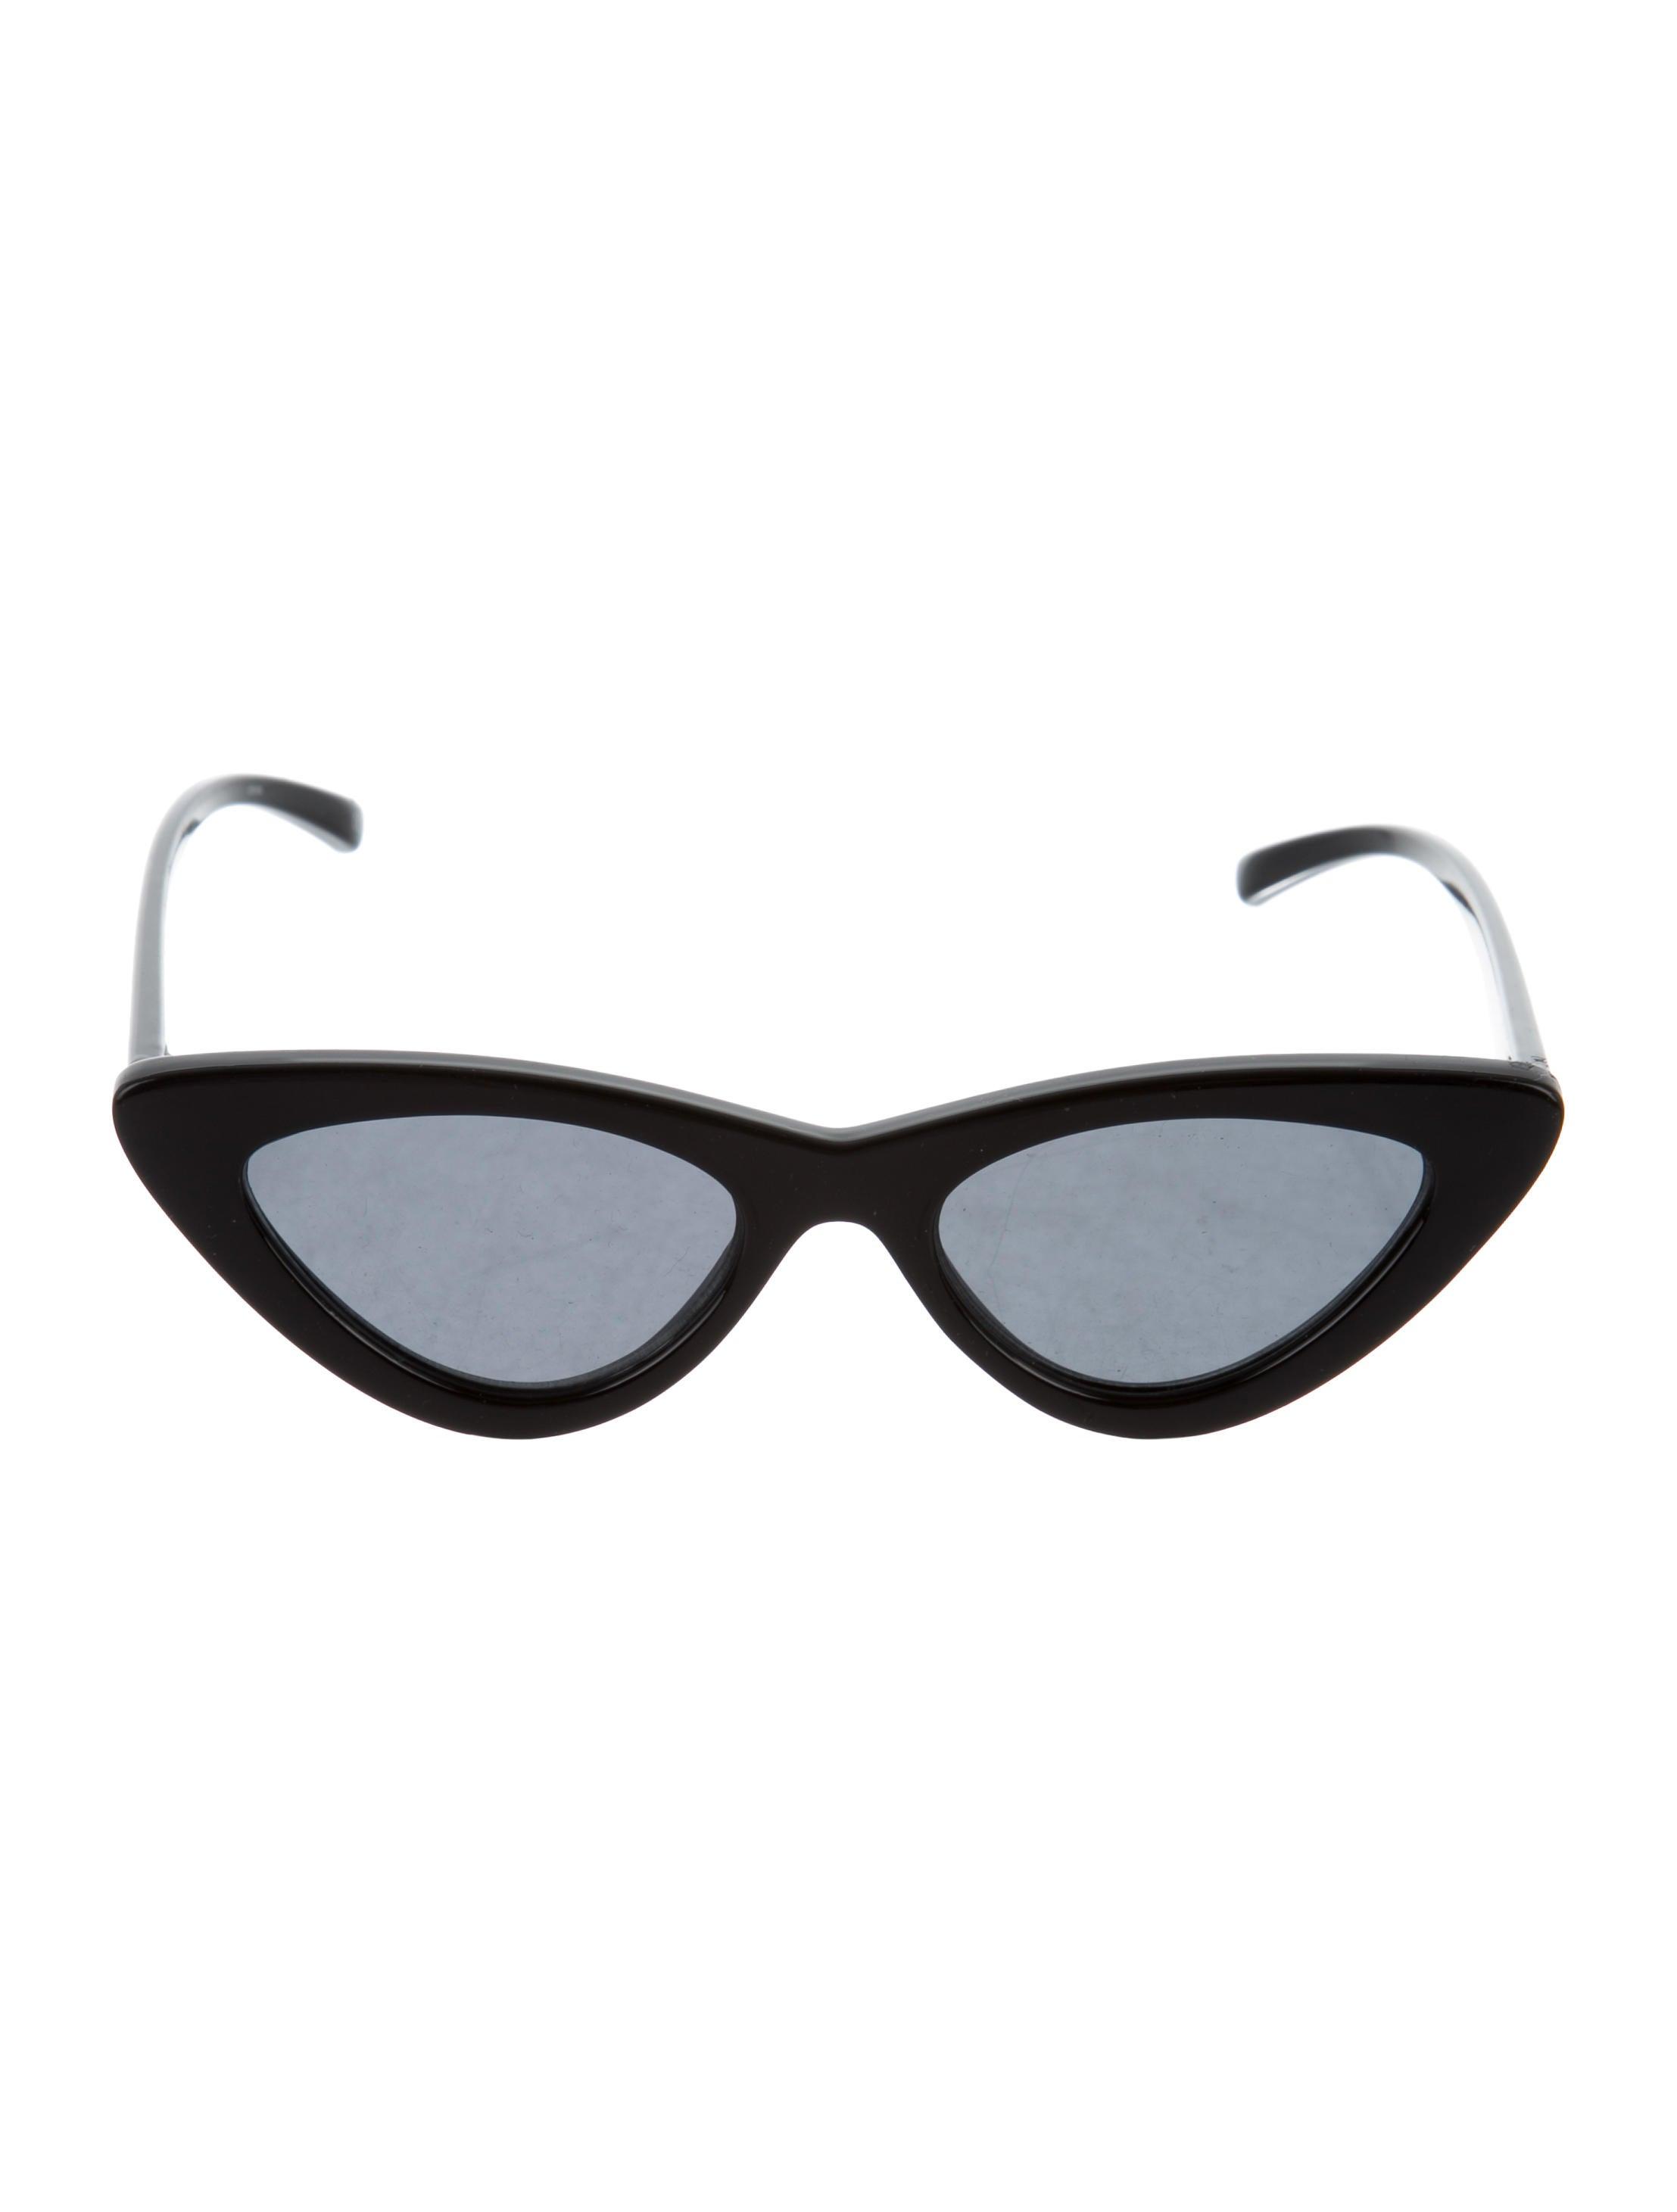 cd91fd8dba Adam Selman x Le Specs The Last Lolita Cat-Eye Sunglasses ...